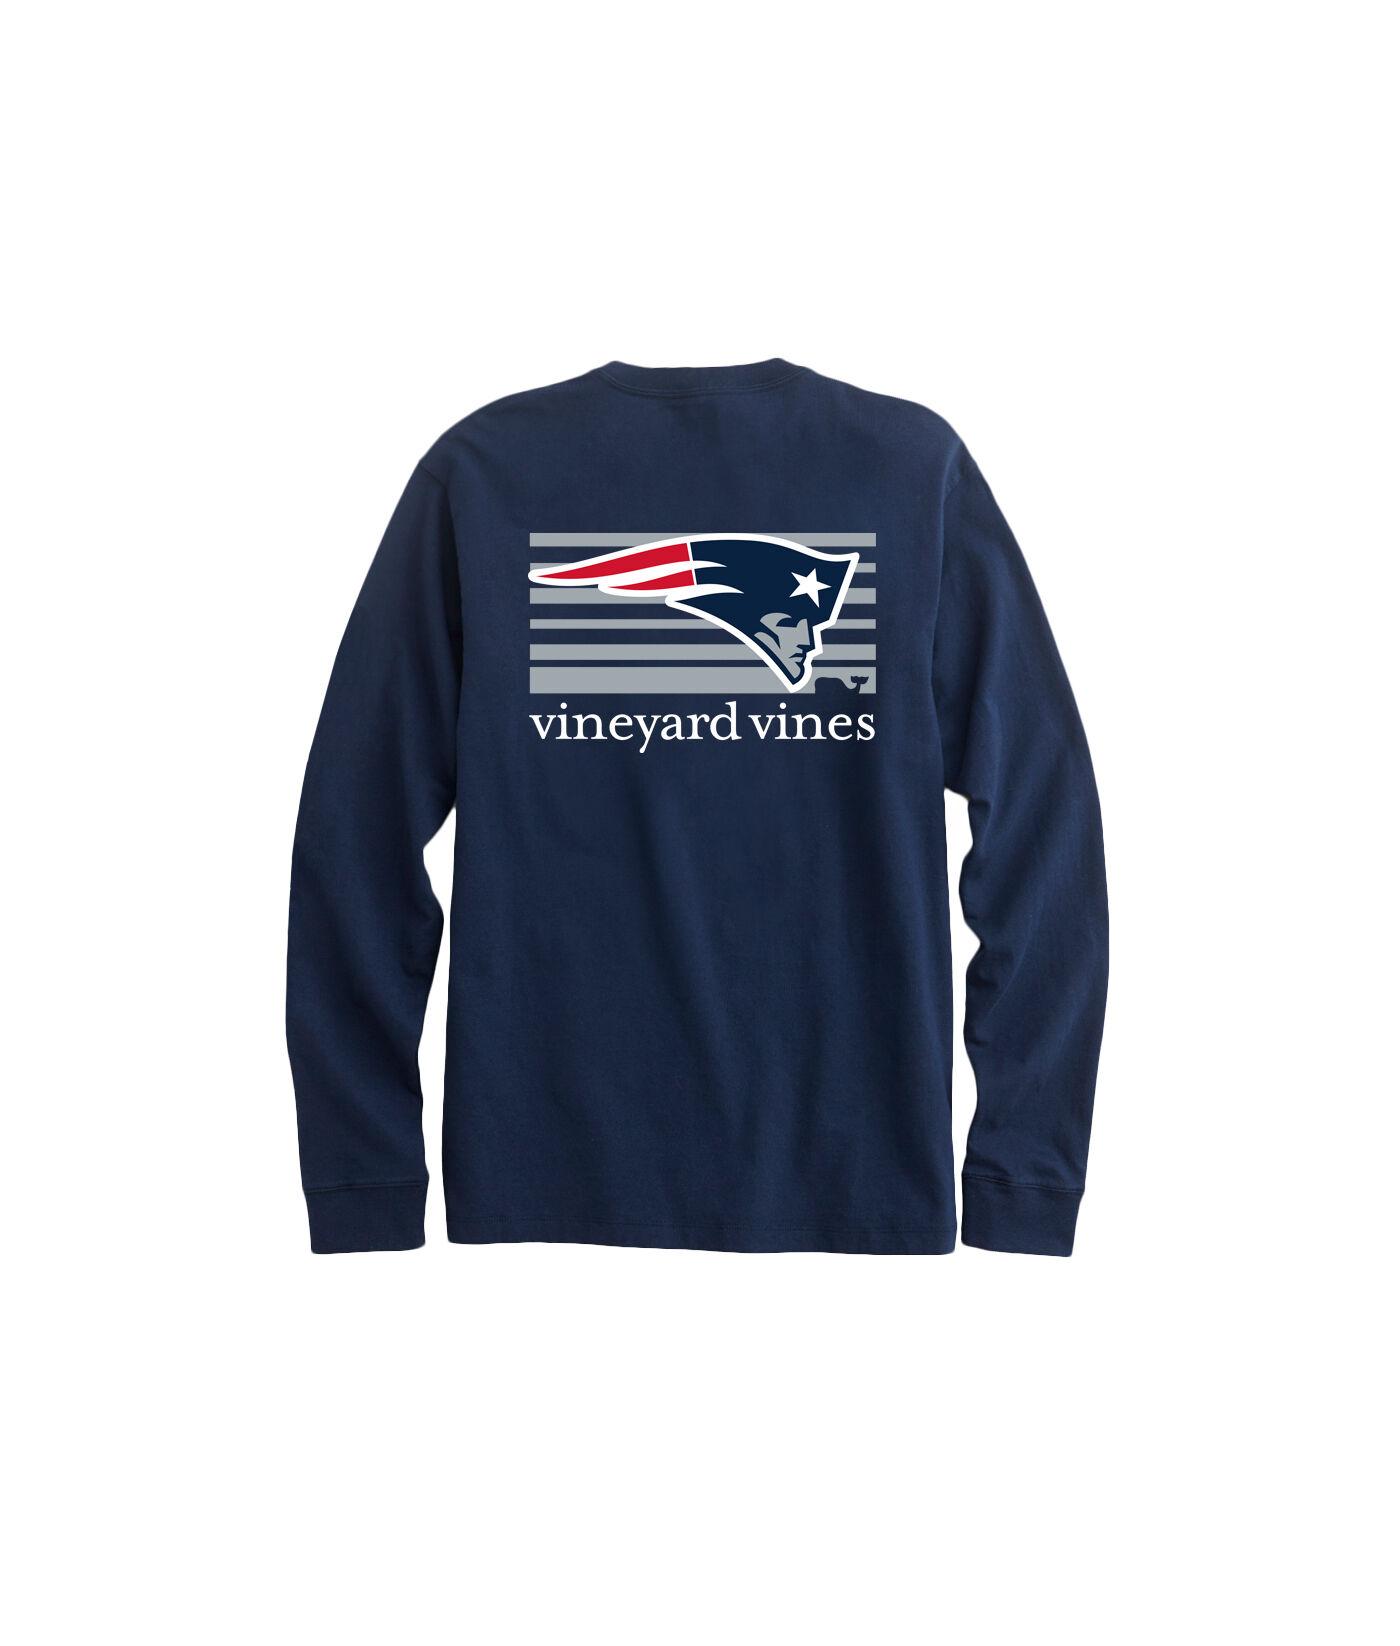 patriots long sleeve shirt